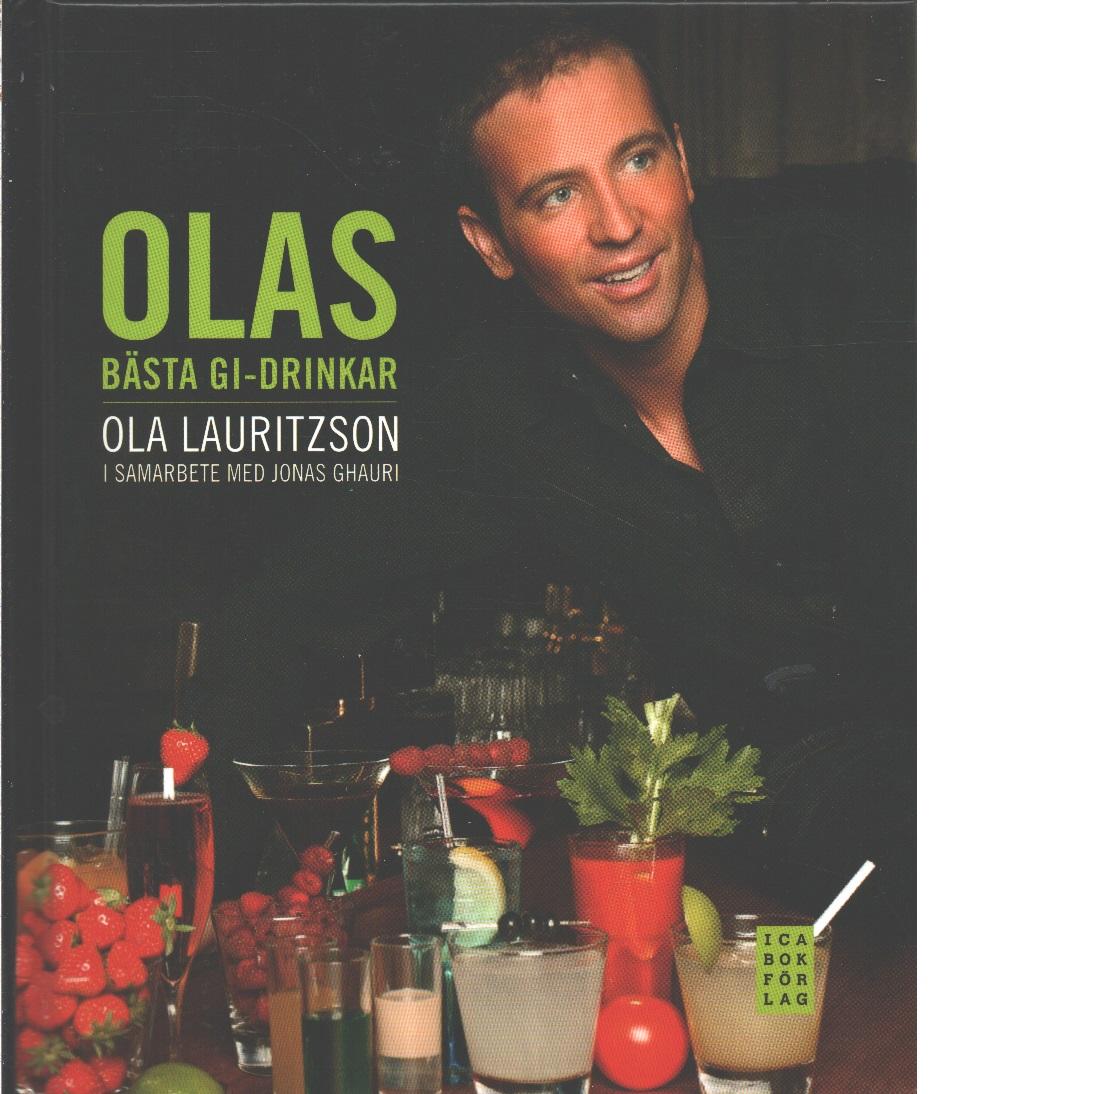 Olas bästa GI-drinkar - Lauritzson, Ola och Ghauri, Jonas